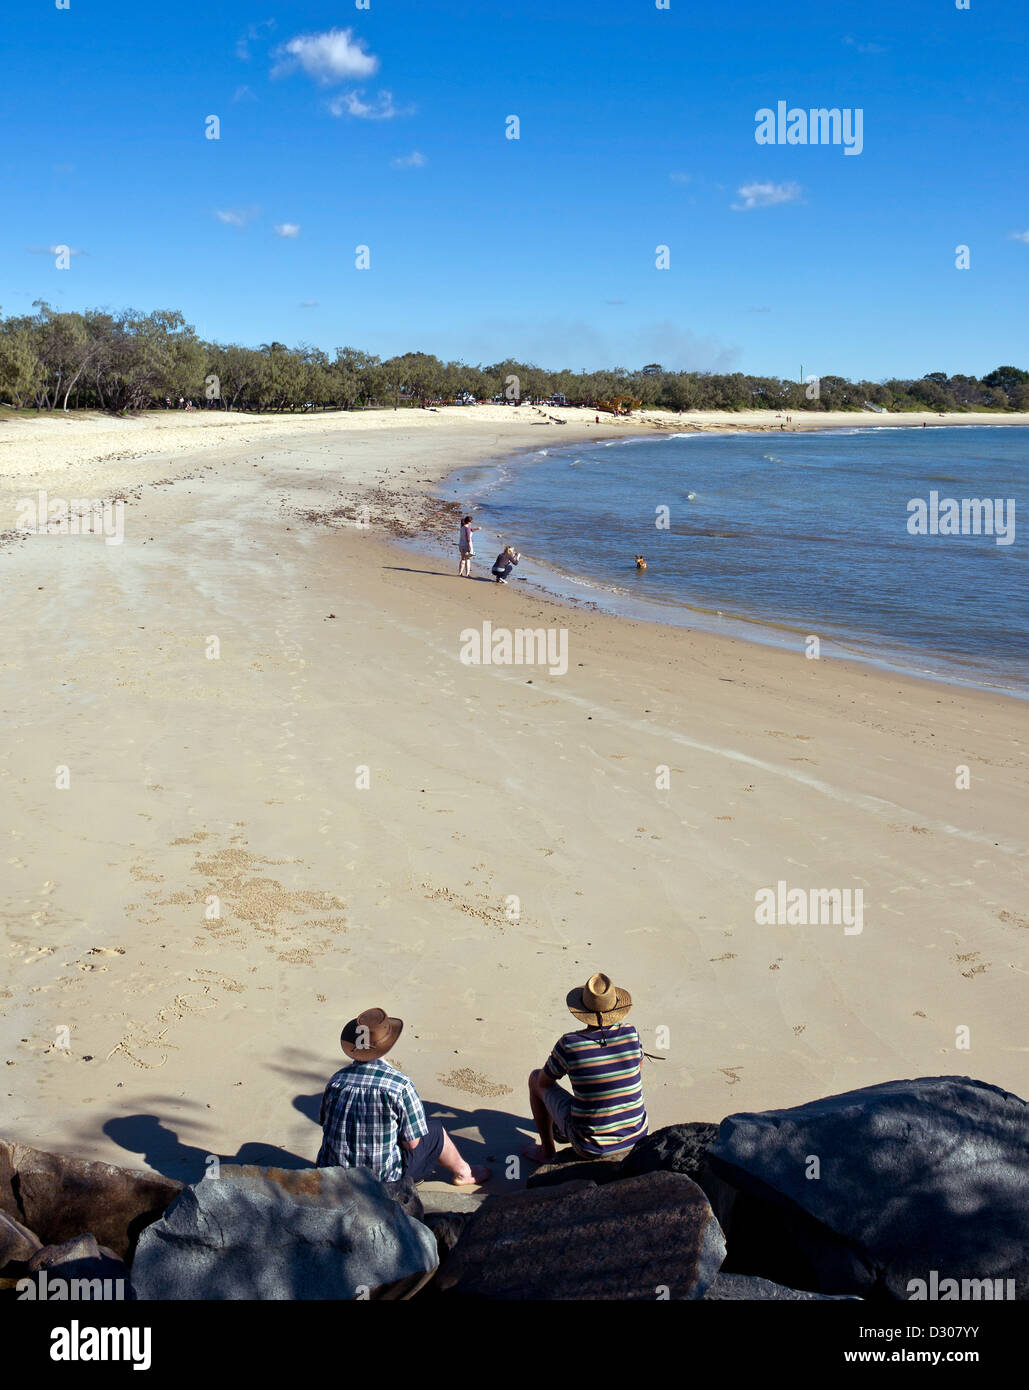 Sunshine Coast in Queensland, Australia - People sitting on Mooloolaba Beach - Stock Image